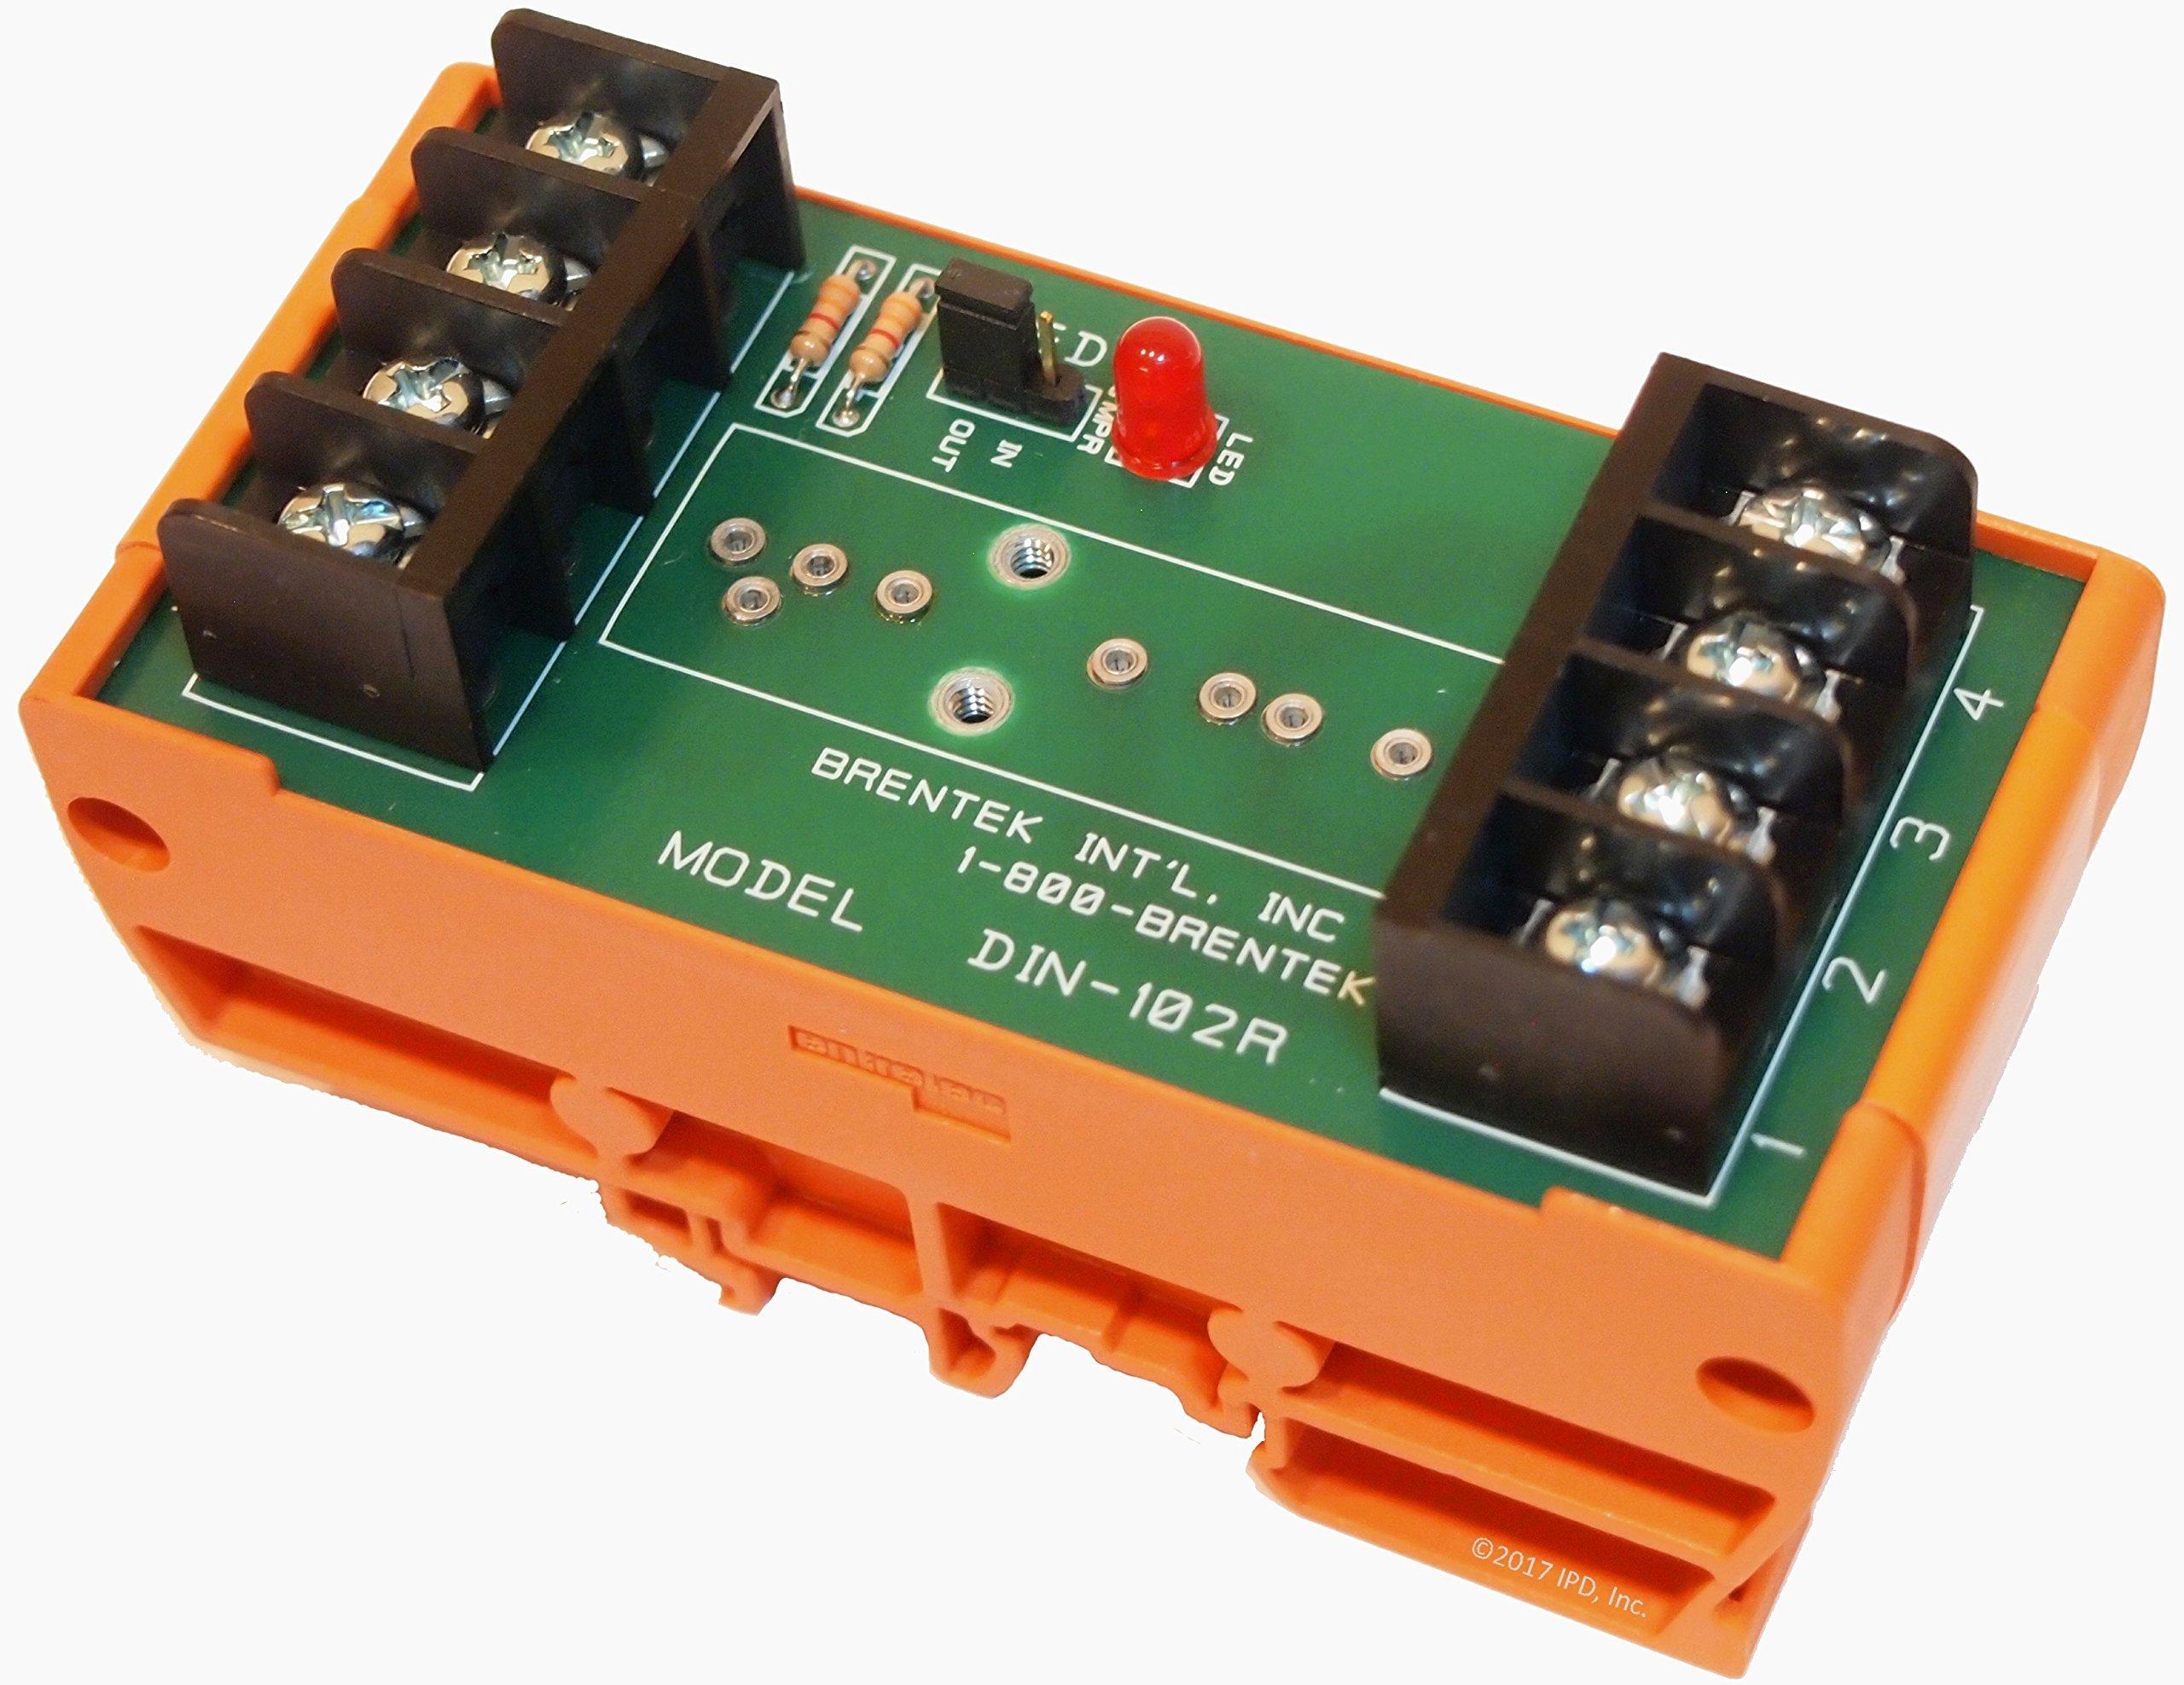 DIN-102R DIN-Mount I/O Module Rack- by Brentek